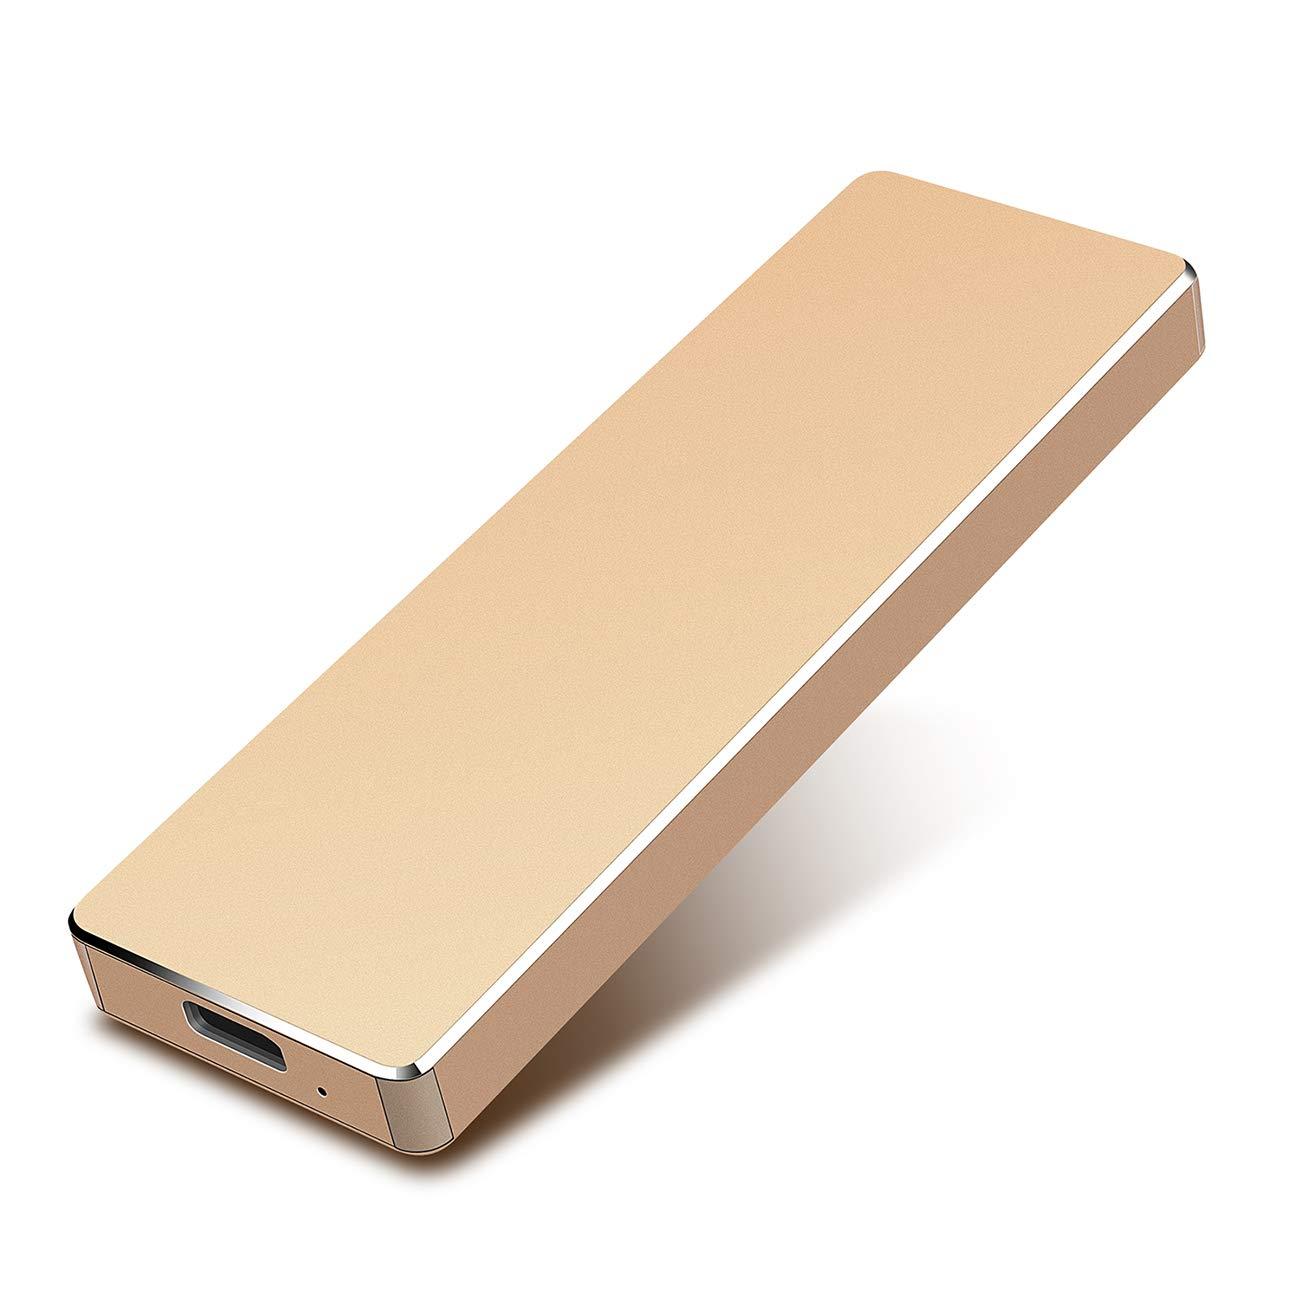 Windows Apple Apelom Disco Duro Externo Port/átil 1TB Mac Type C USB3.1 SATA HDD Almacenamiento para PC Xbox 360 X 1 TB, Rojo